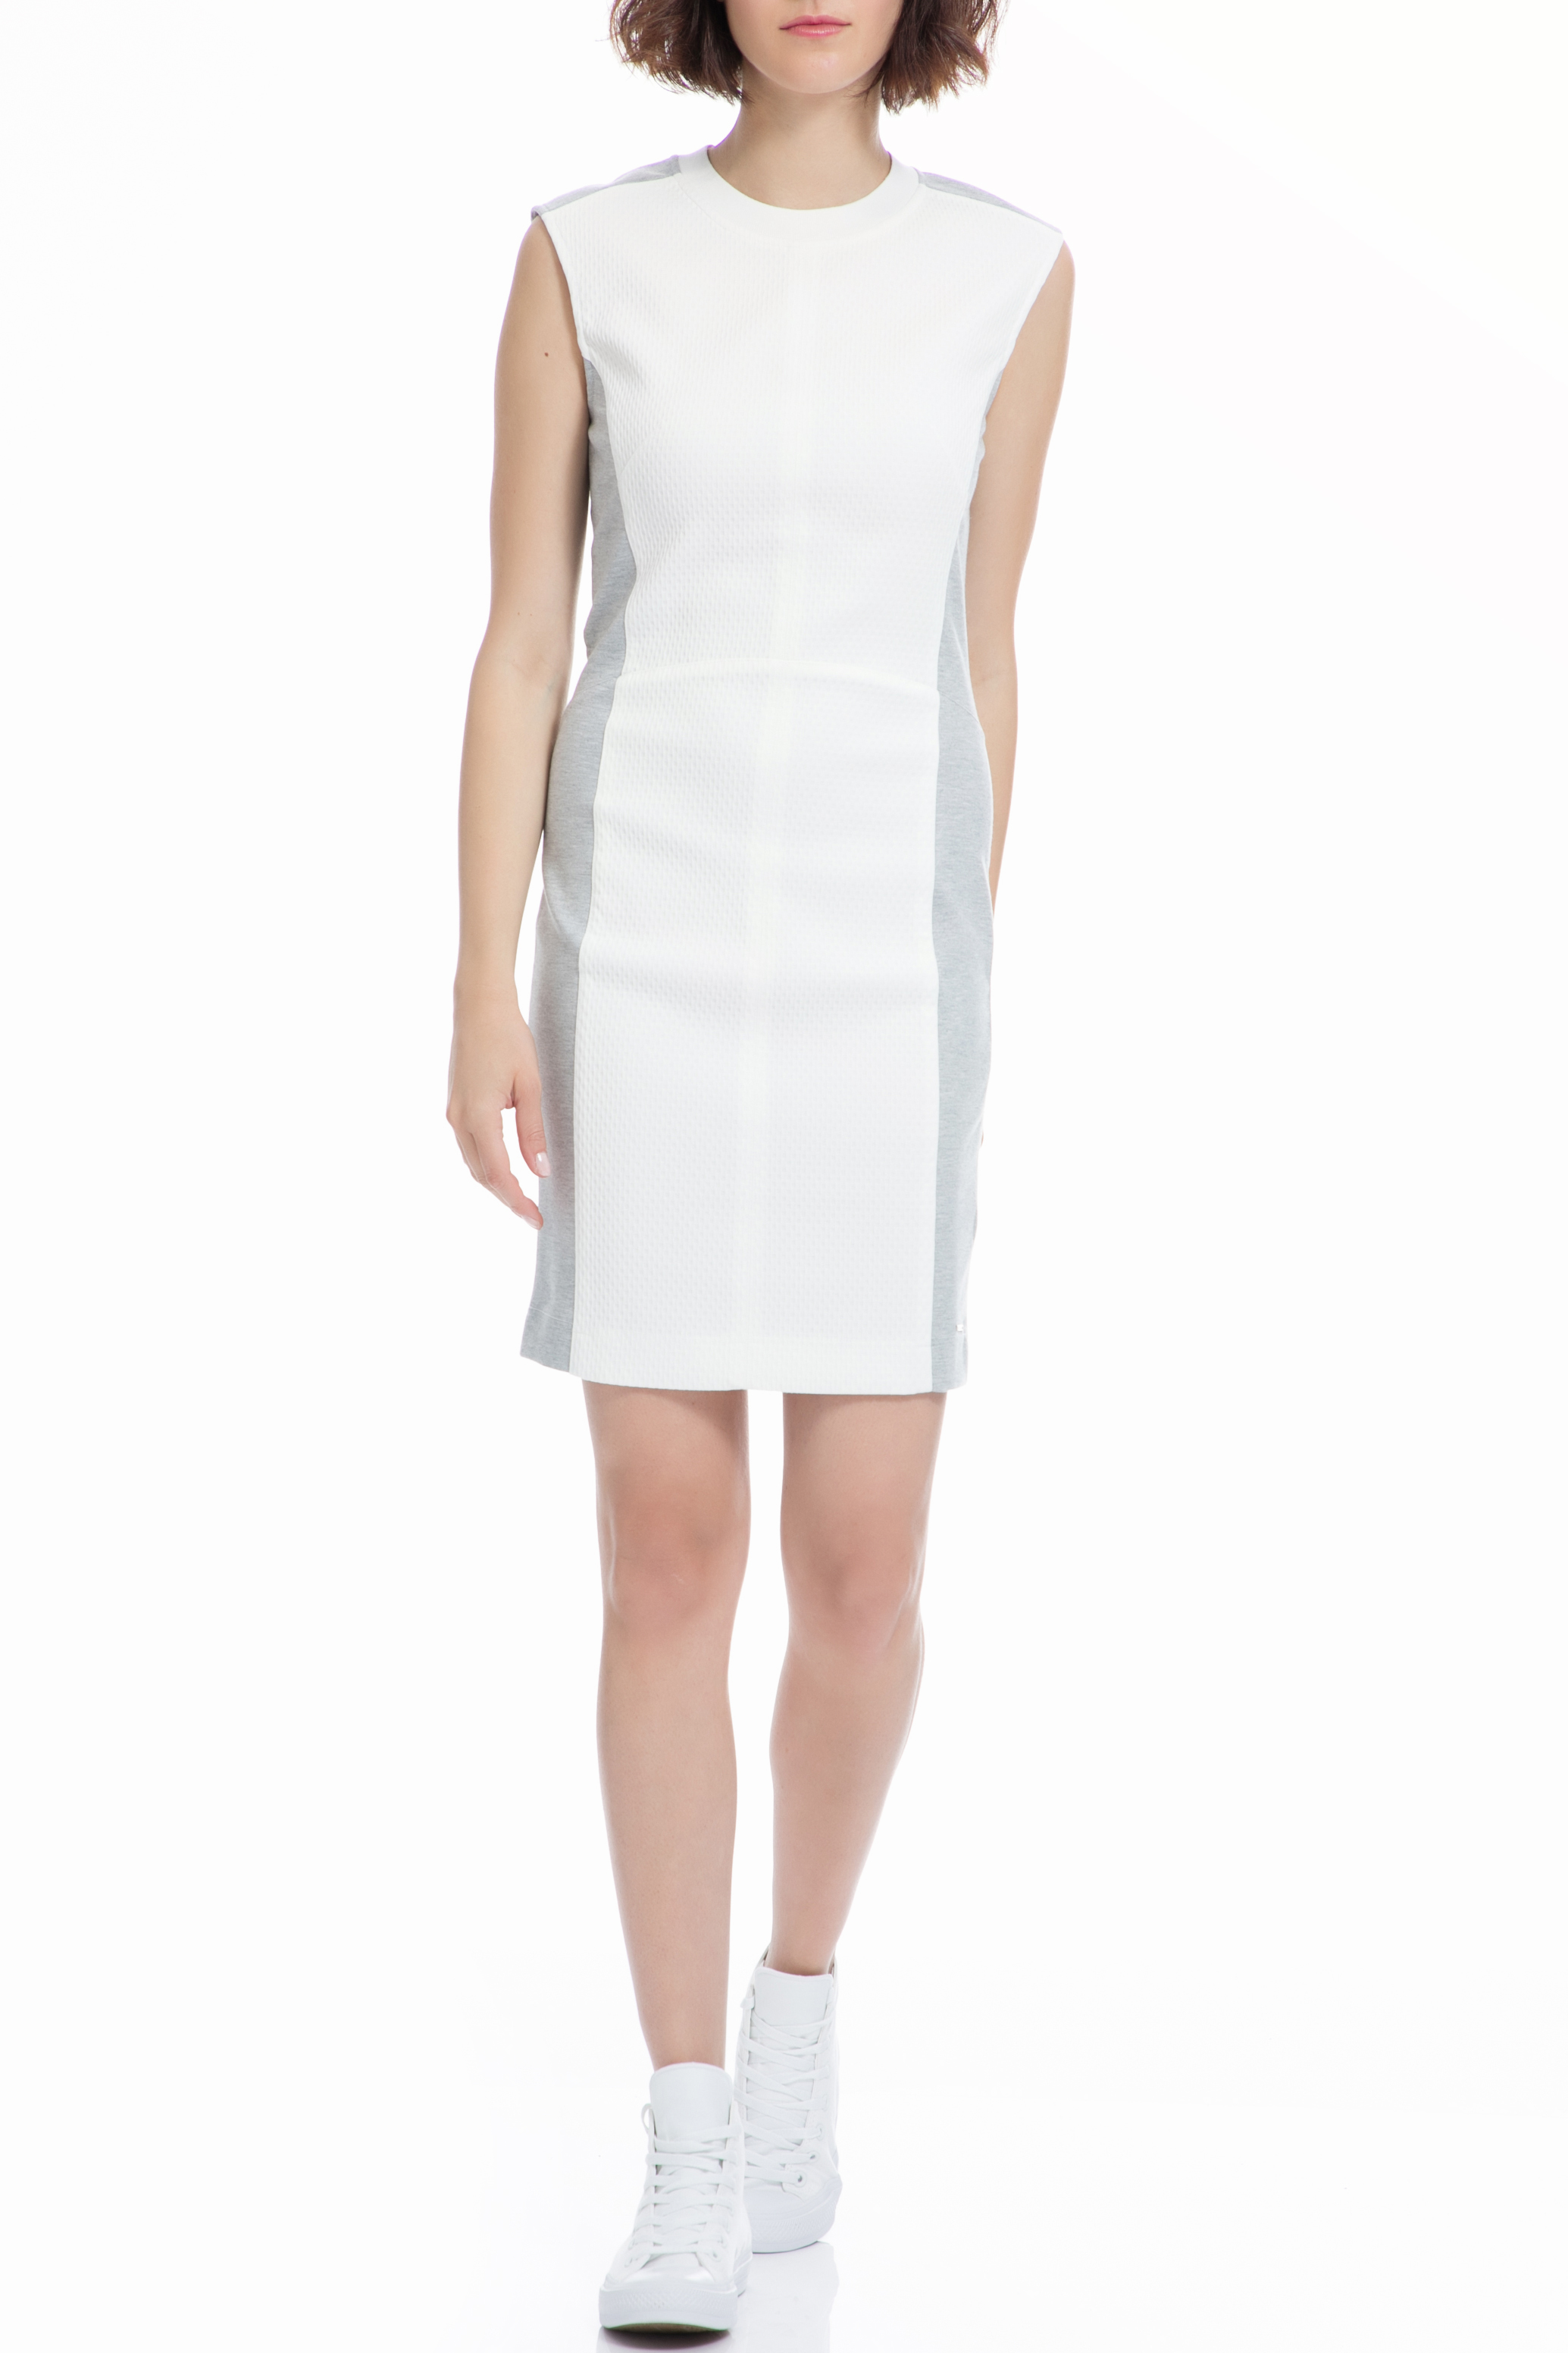 CALVIN KLEIN JEANS - Γυναικείο φόρεμα CALVIN KLEIN JEANS λευκό γυναικεία ρούχα φορέματα μίνι